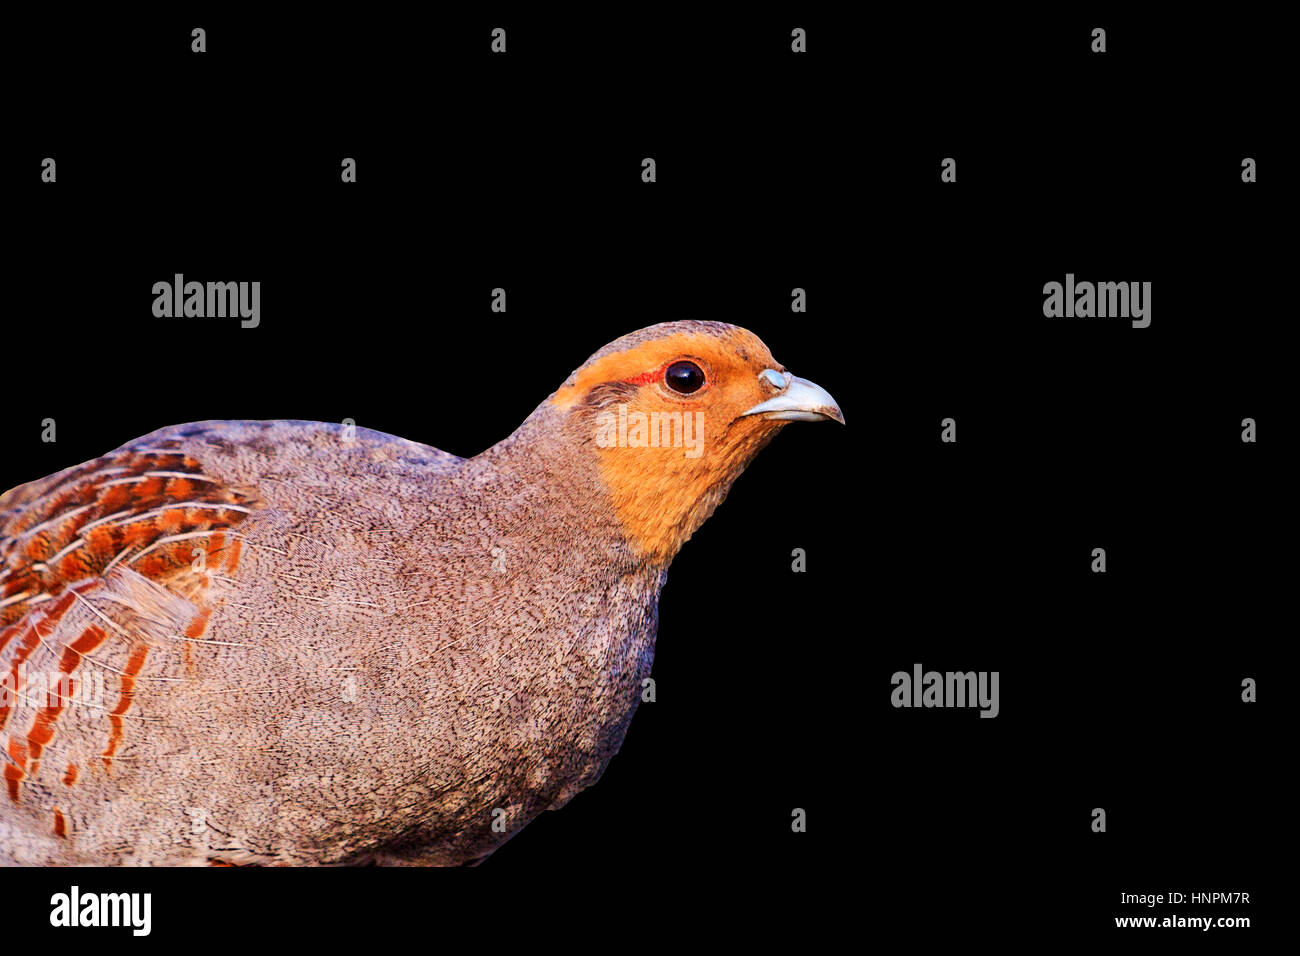 grey partridge on black background,Season 2017, opening of hunting, wildlife, wild bird - Stock Image